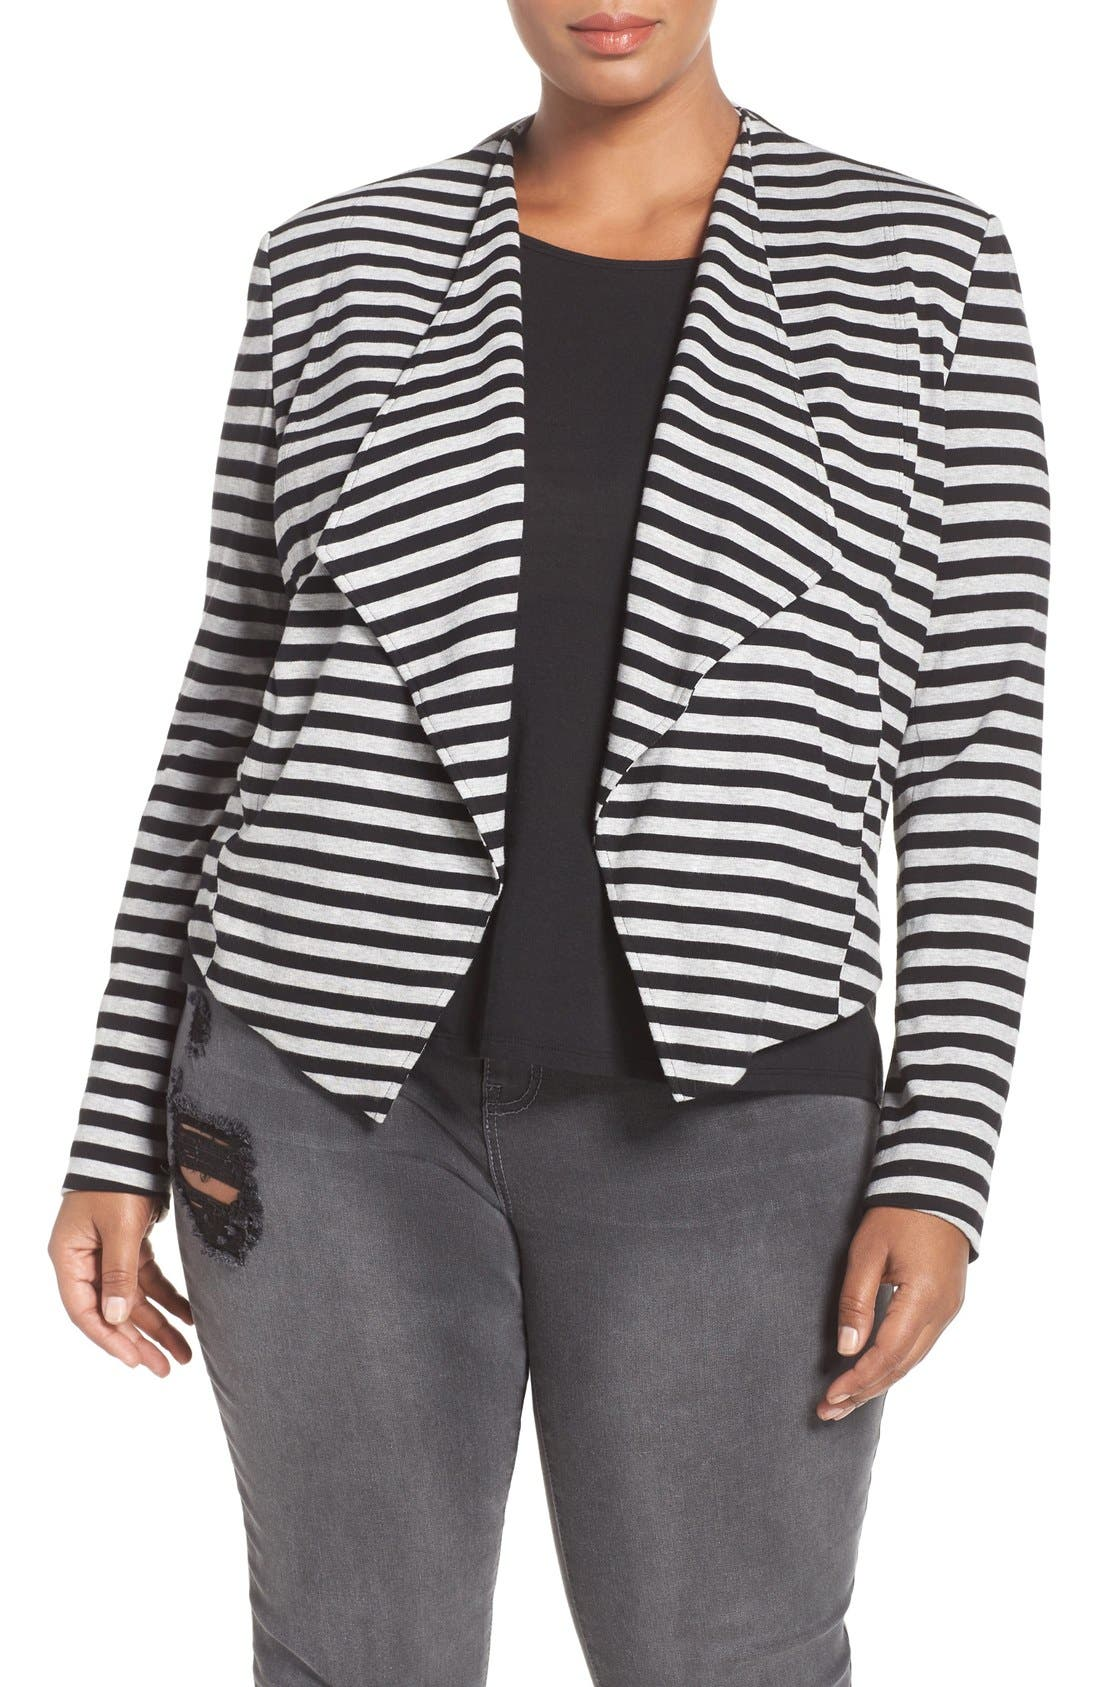 'Veronicka' Stripe Knit Open Front Jacket,                         Main,                         color, Black/ Heather Grey Stripe